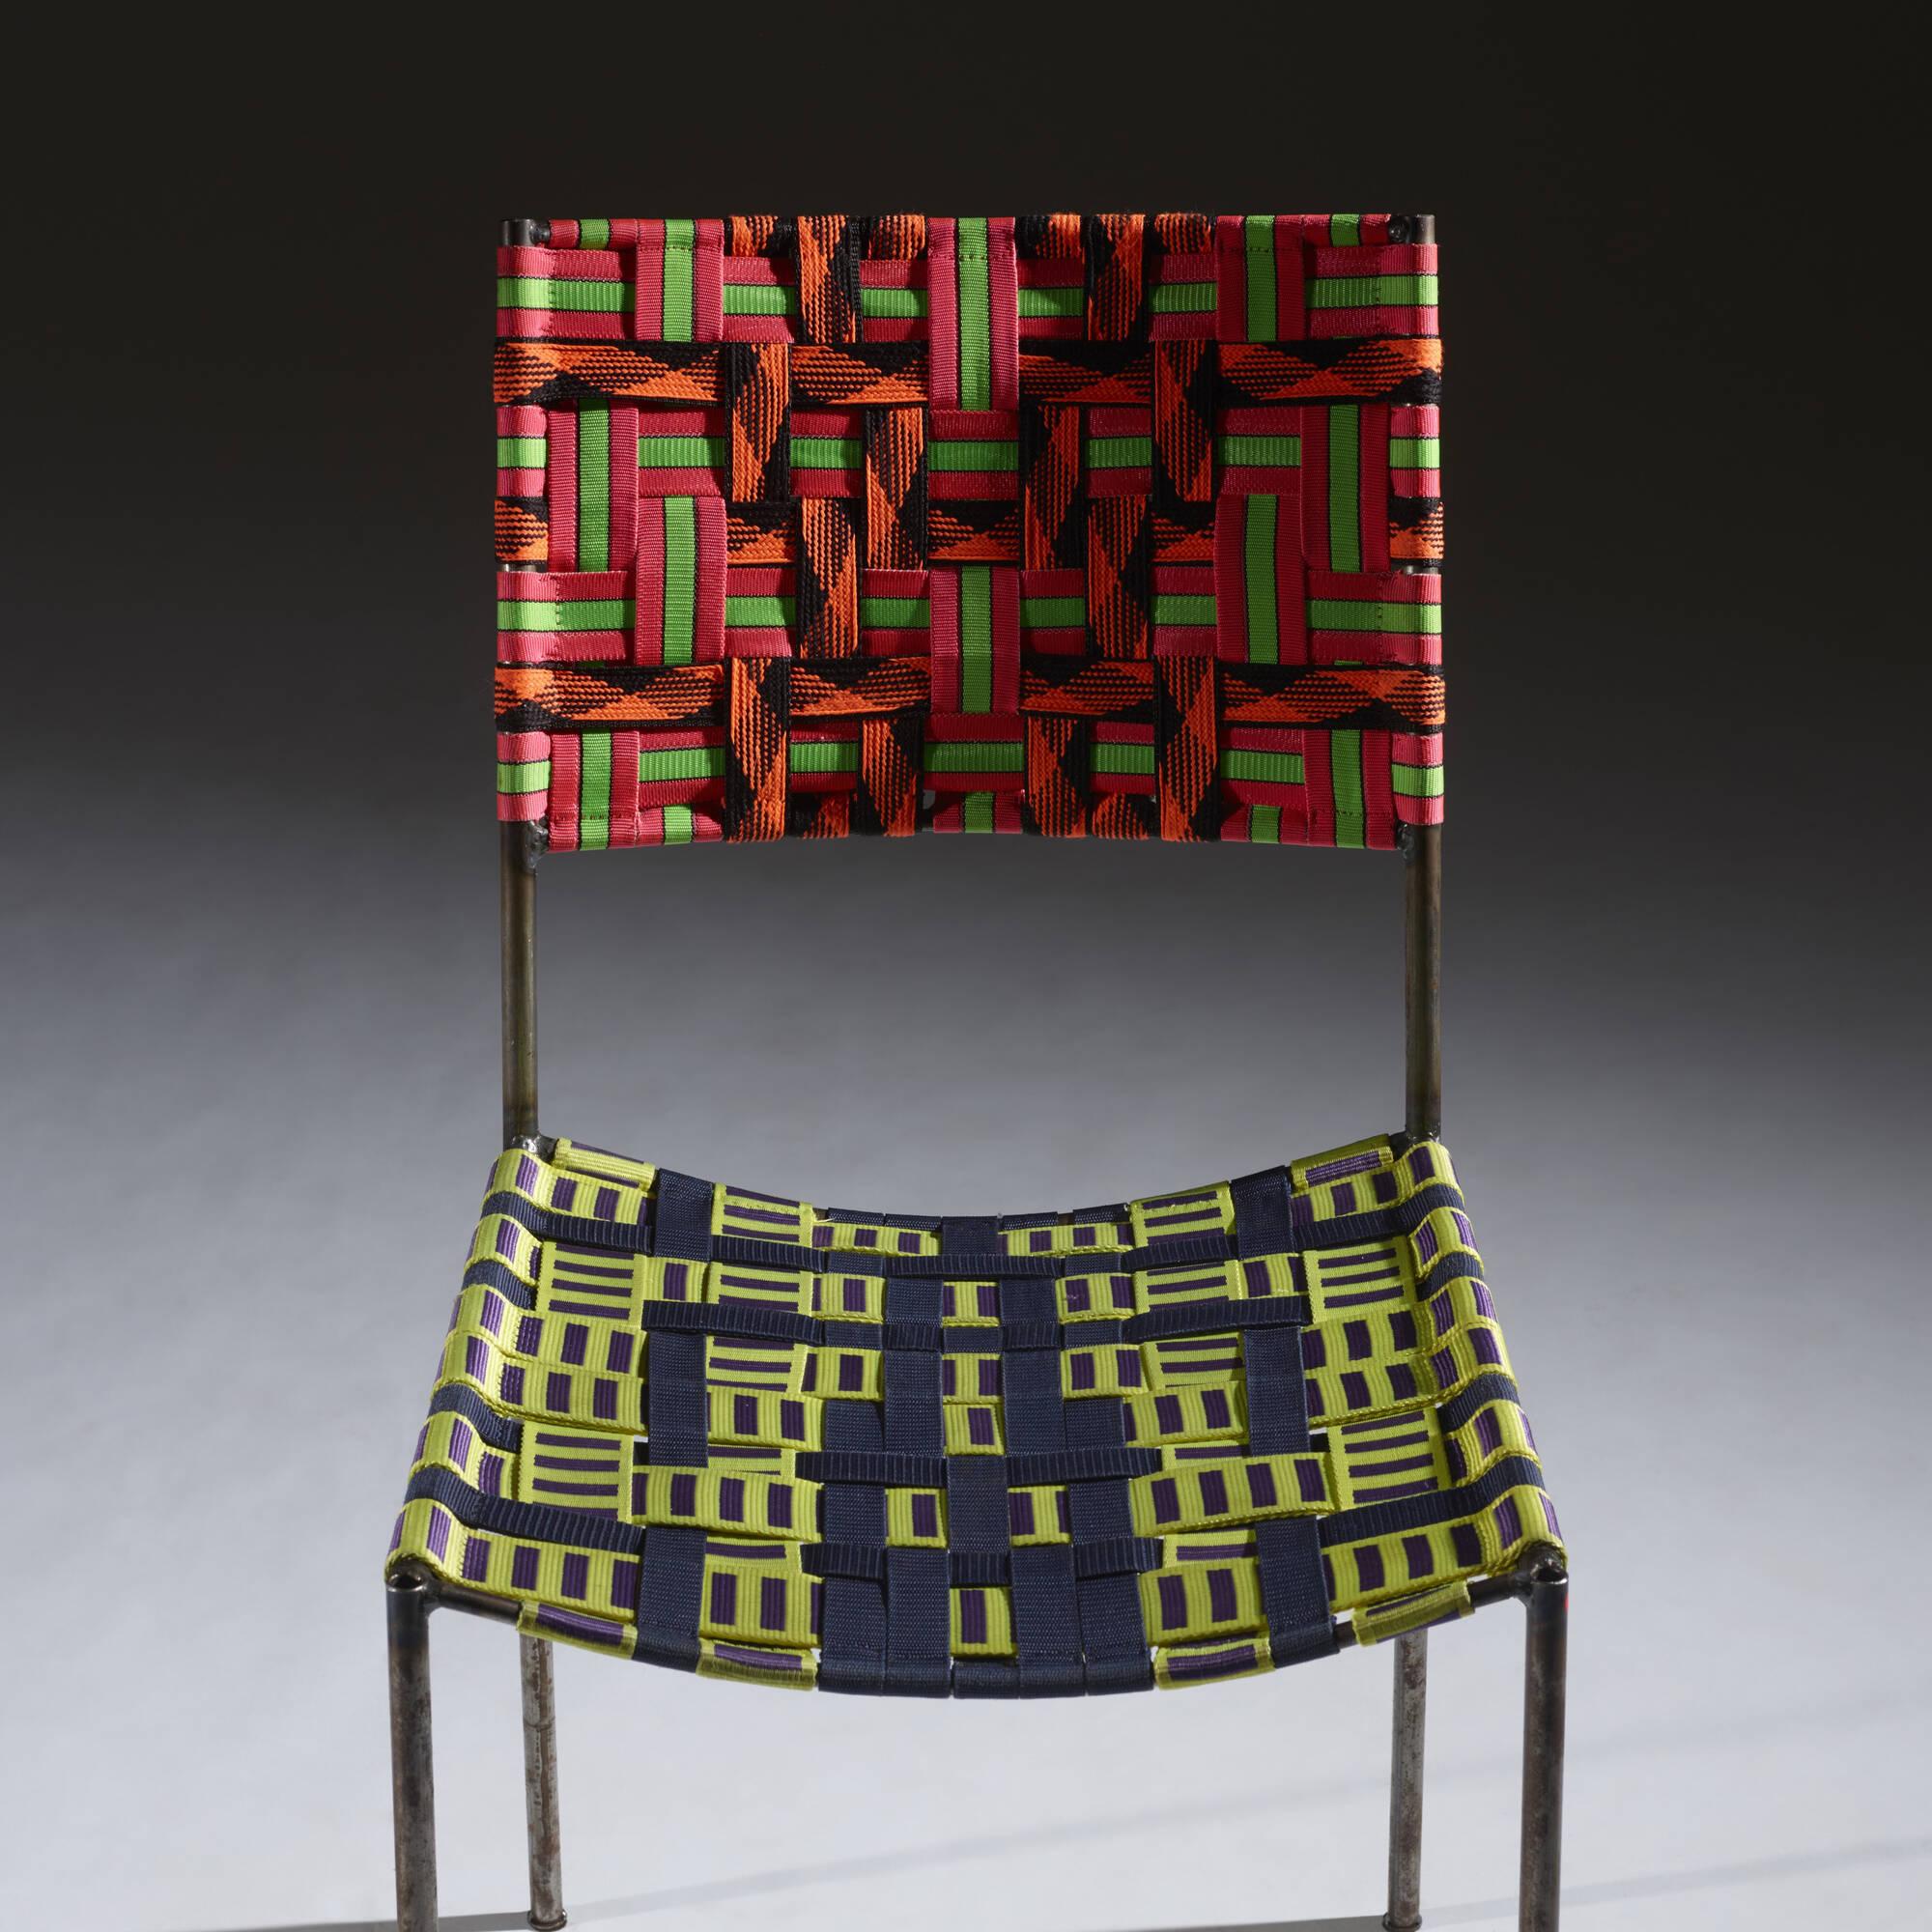 235: Franz West / Onkel chair (3 of 3)